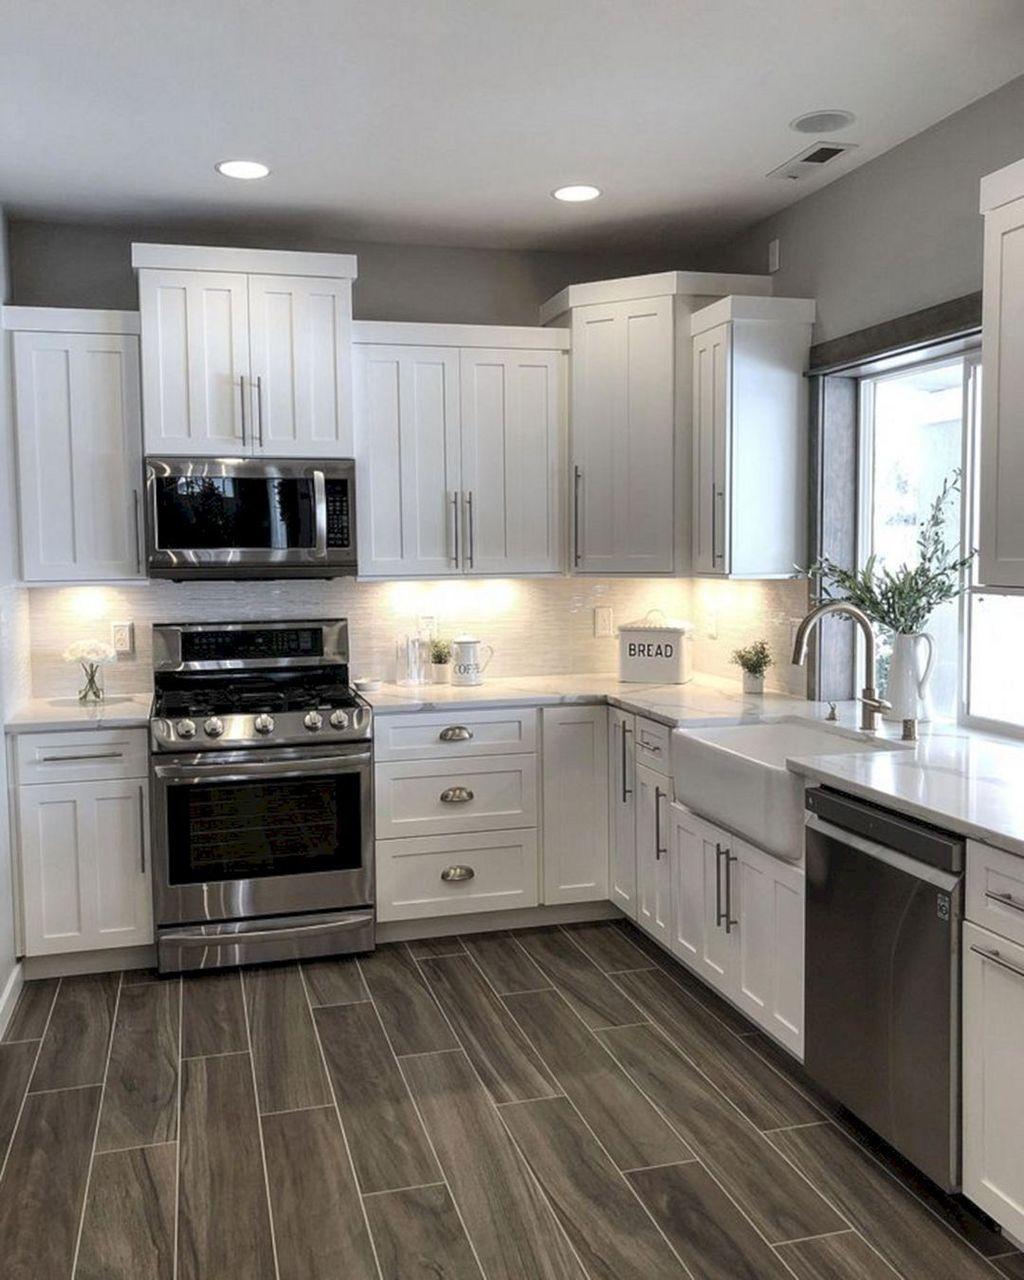 Popular Apartment Kitchen Design Ideas You Should Copy 09 ...